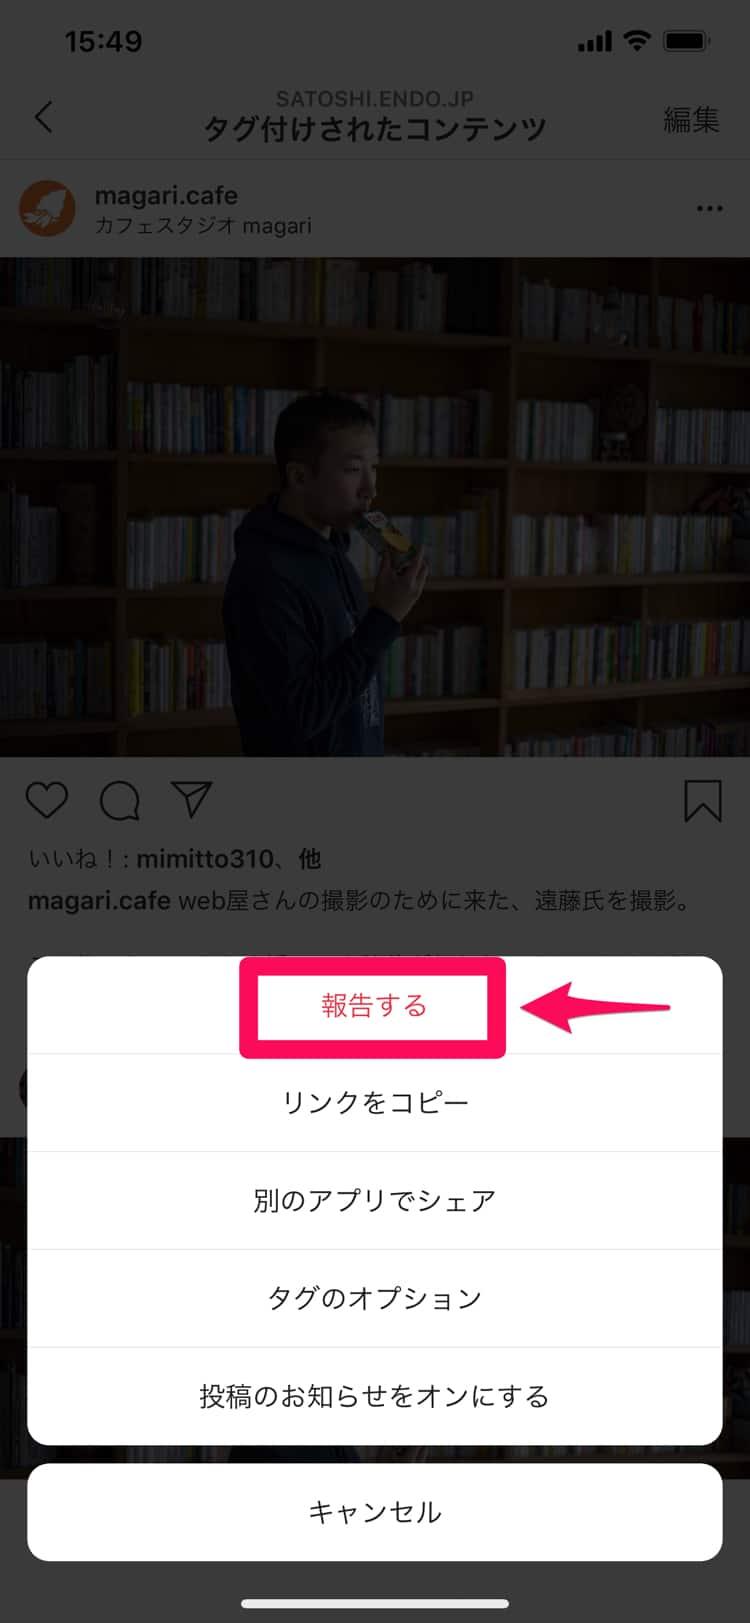 Instagramでスパムの報告をする